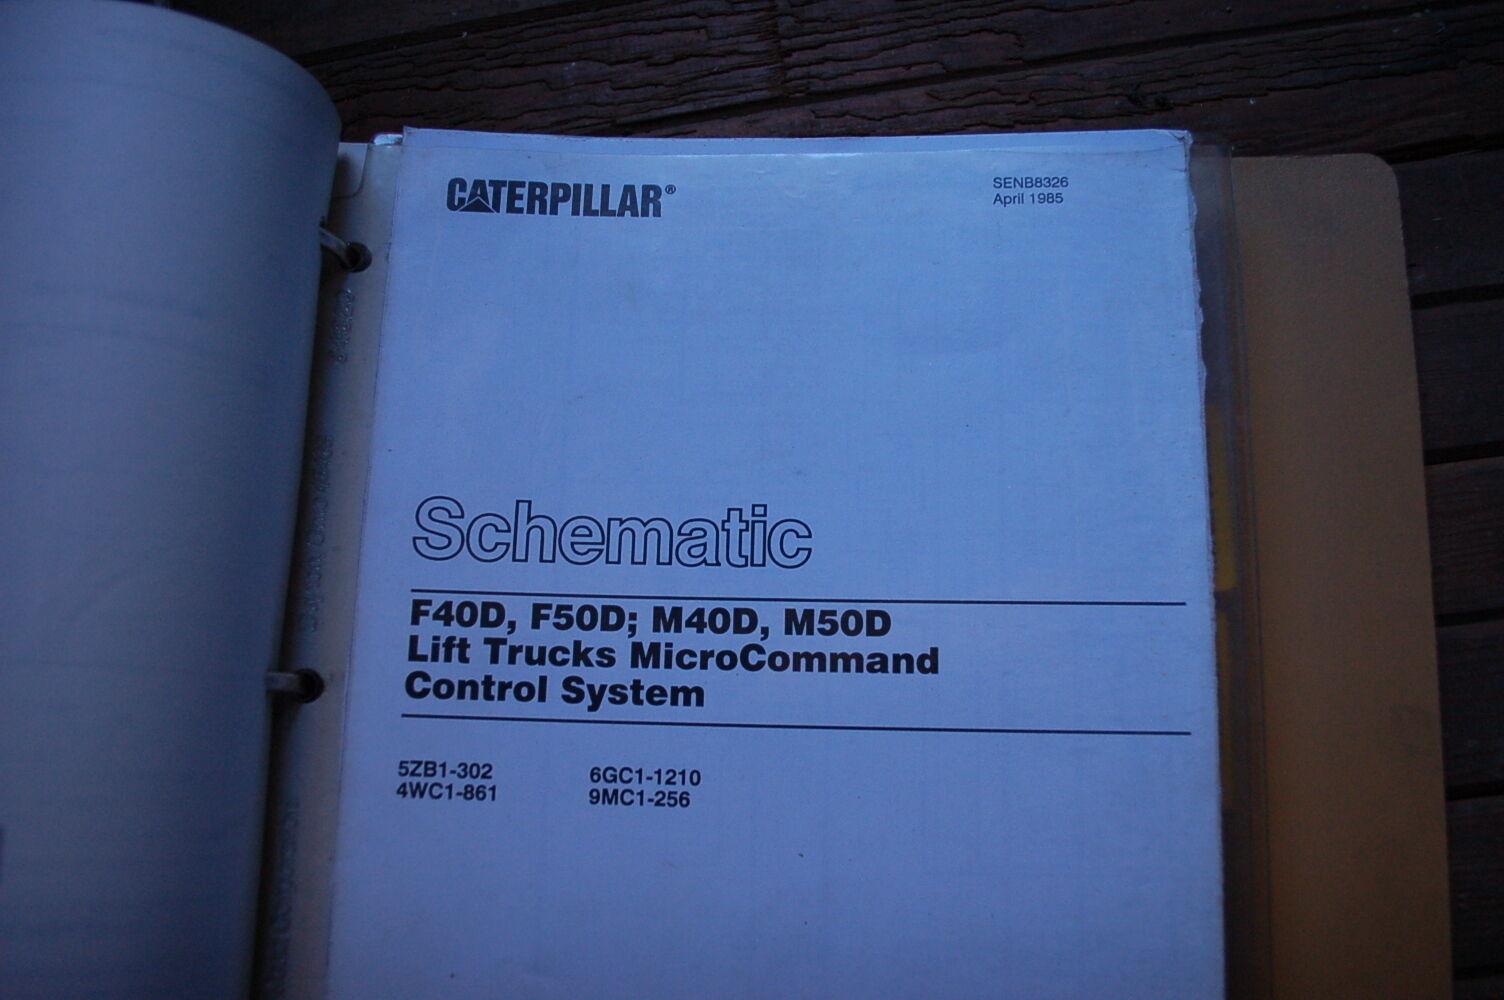 Caterpillar F40d F50d F60d Forklift Service Manual Towmotor Book Schematic 3 Of 6 Repair Owner 4